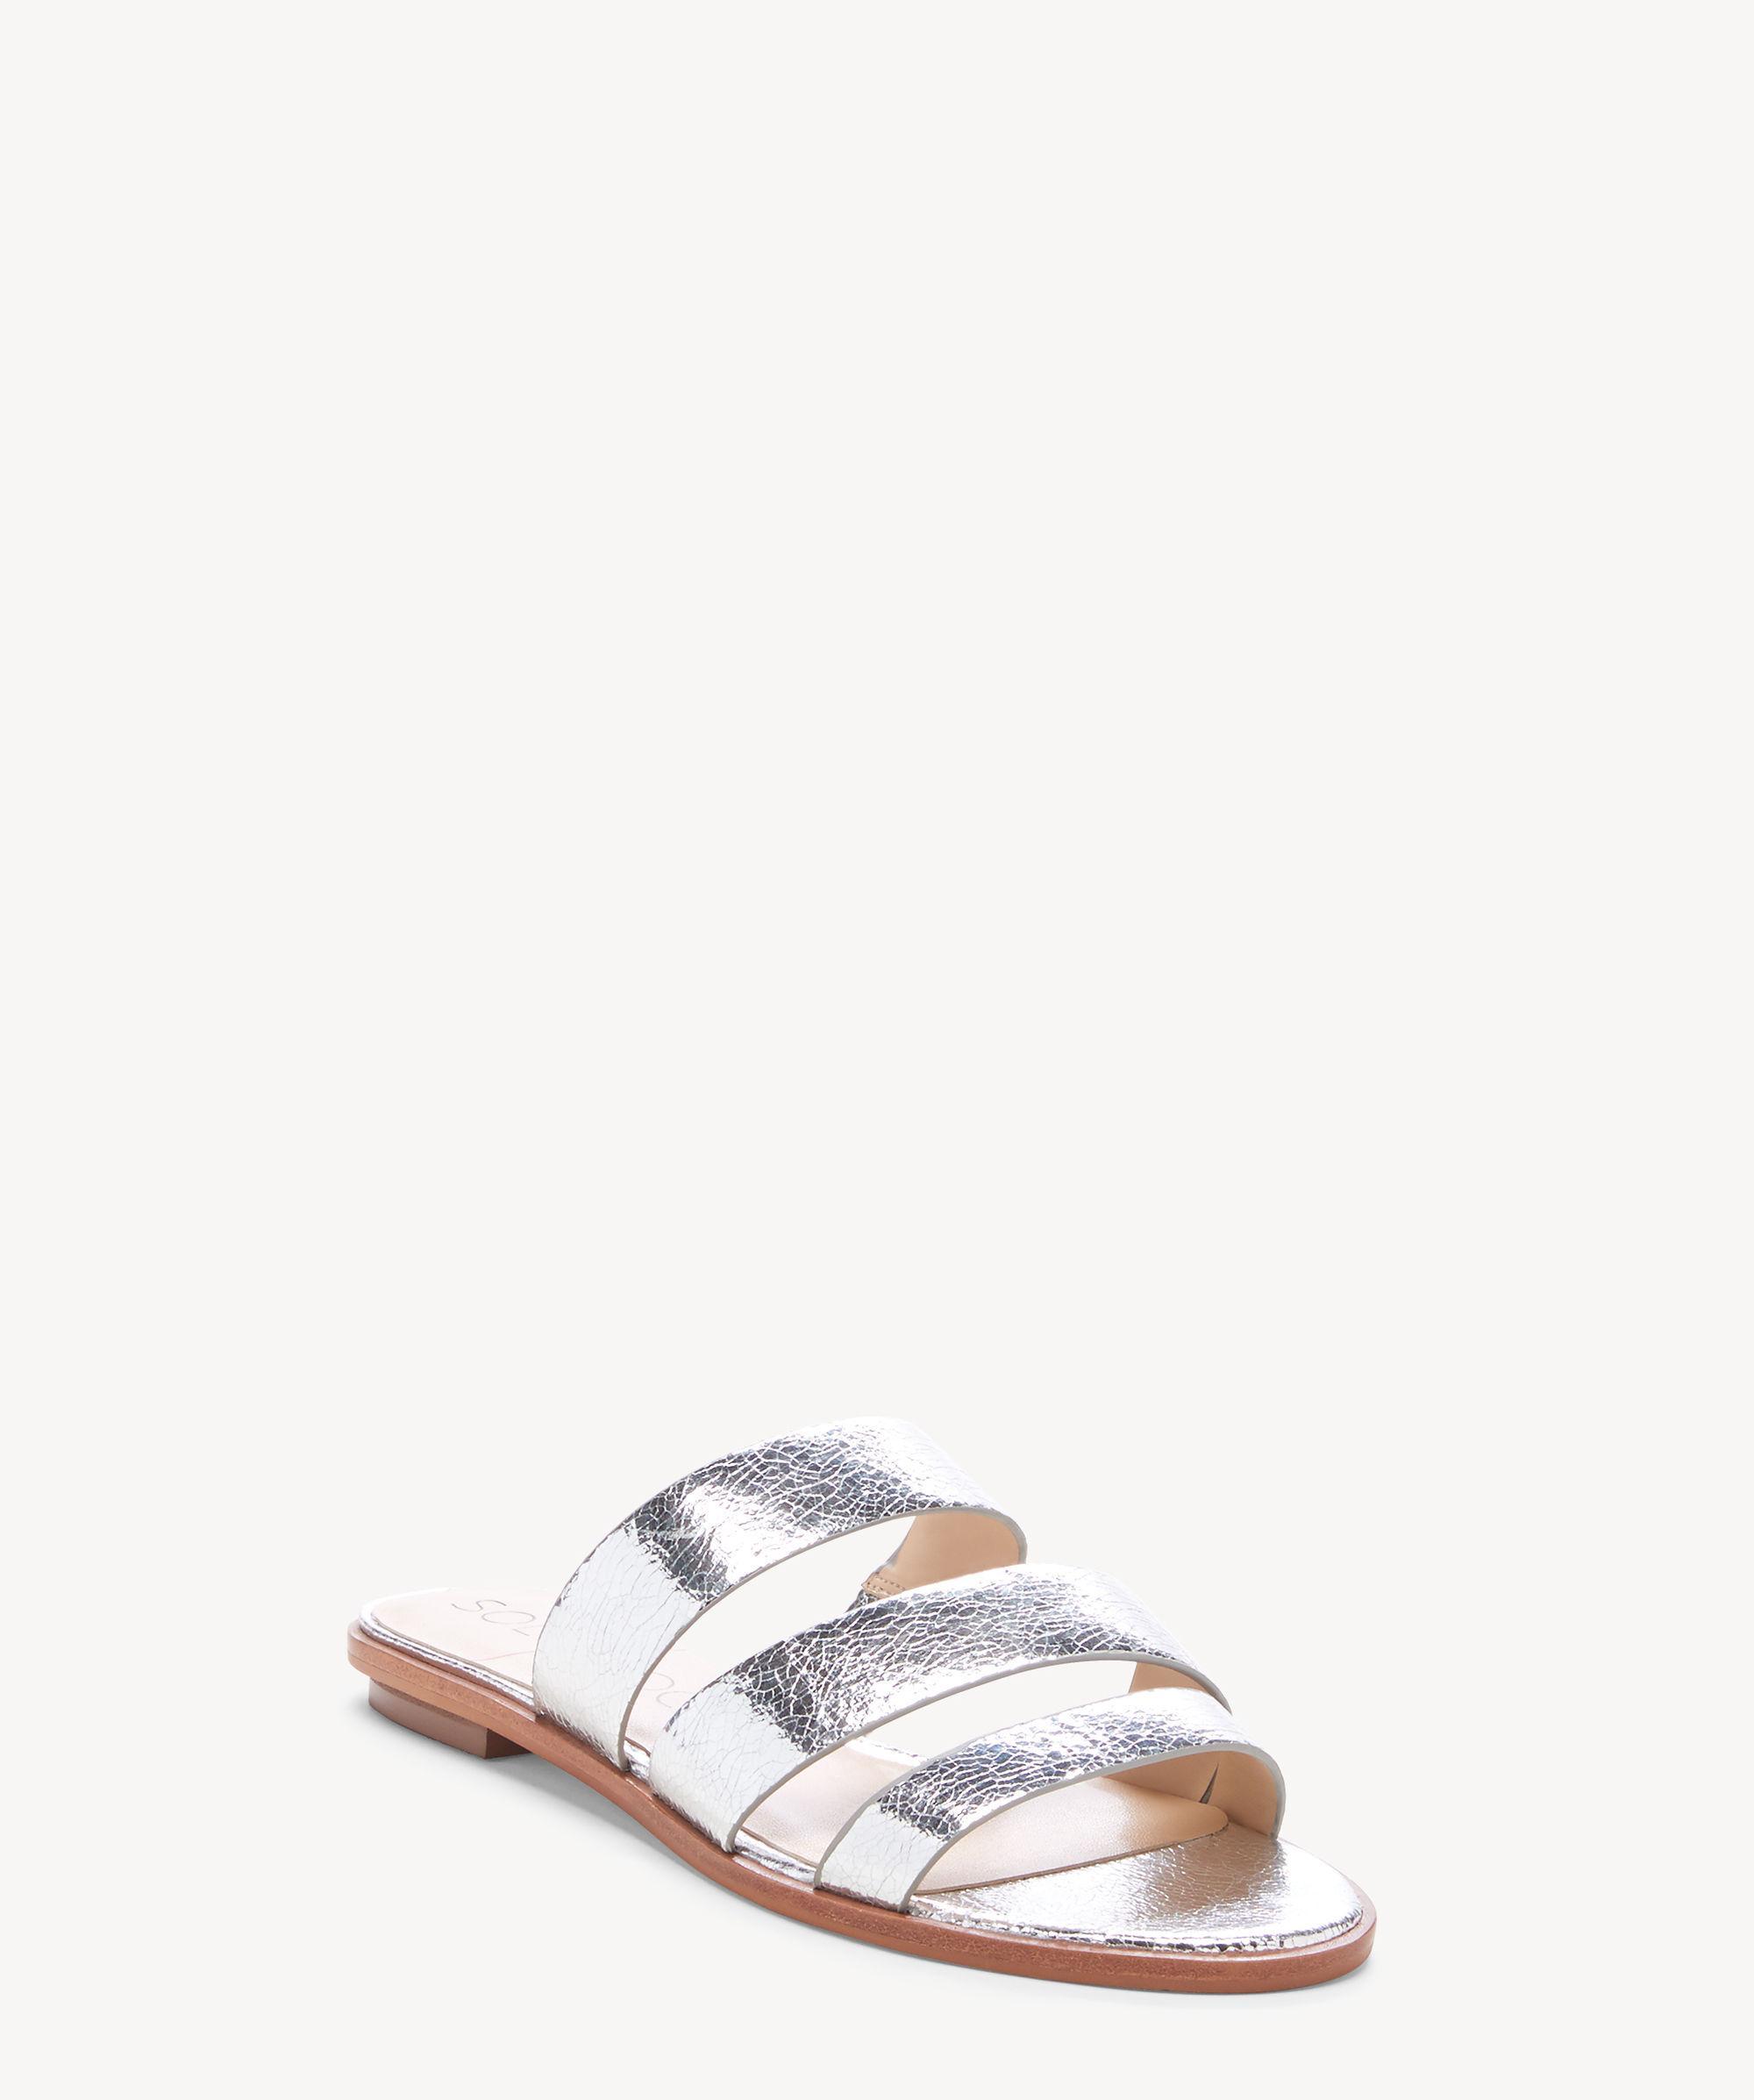 b40b695135ce Lyst - Sole Society Simonaa (gleaming Silver) Women s Sandals in Metallic -  Save 11%